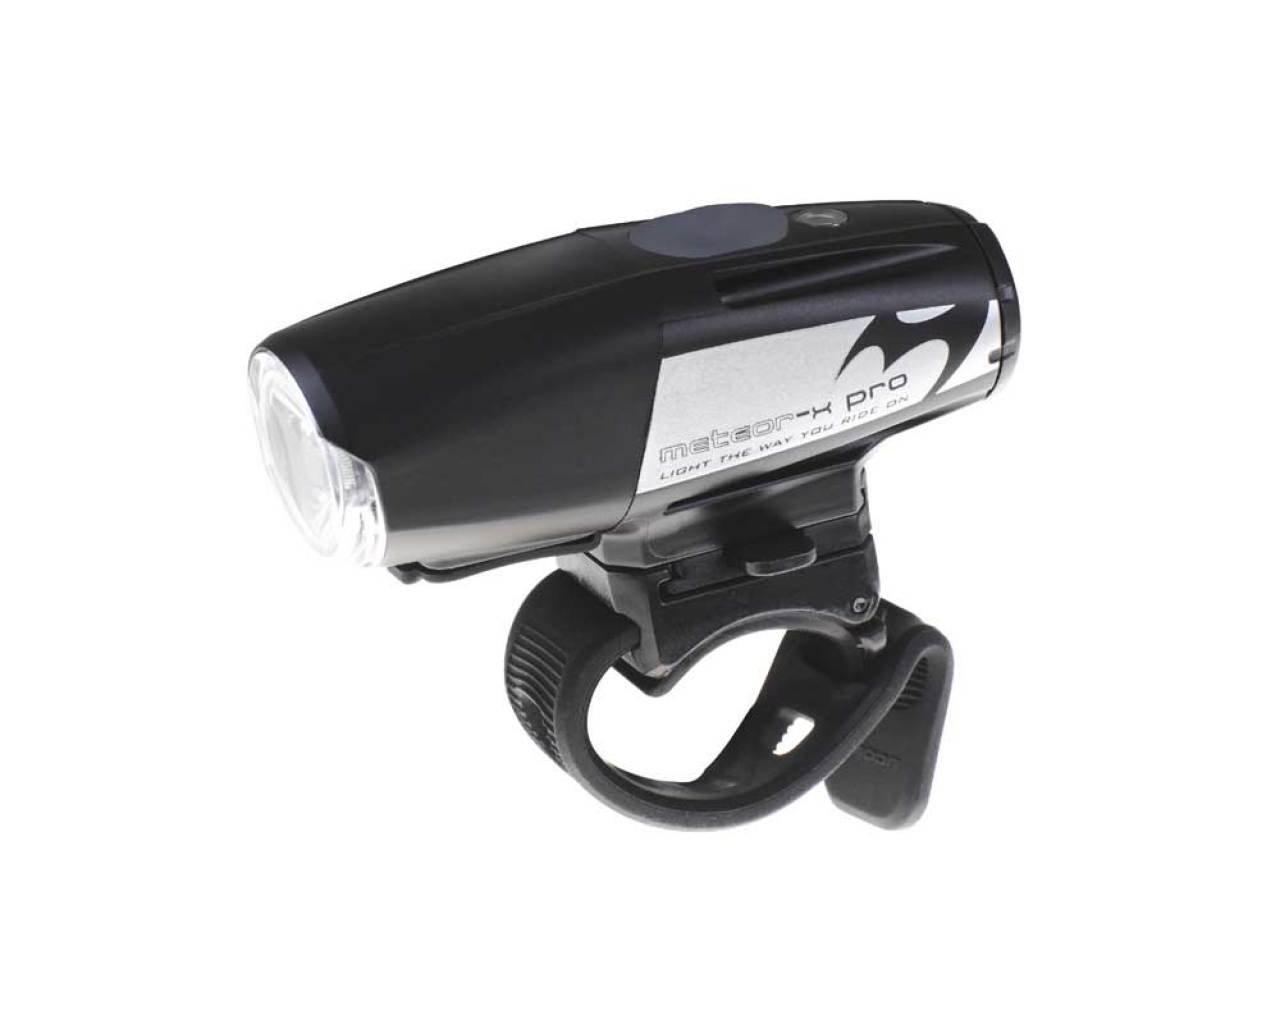 Moon Meteor-X Auto Pro Front Bike Cycle LED Light 700 Lumens LAA427